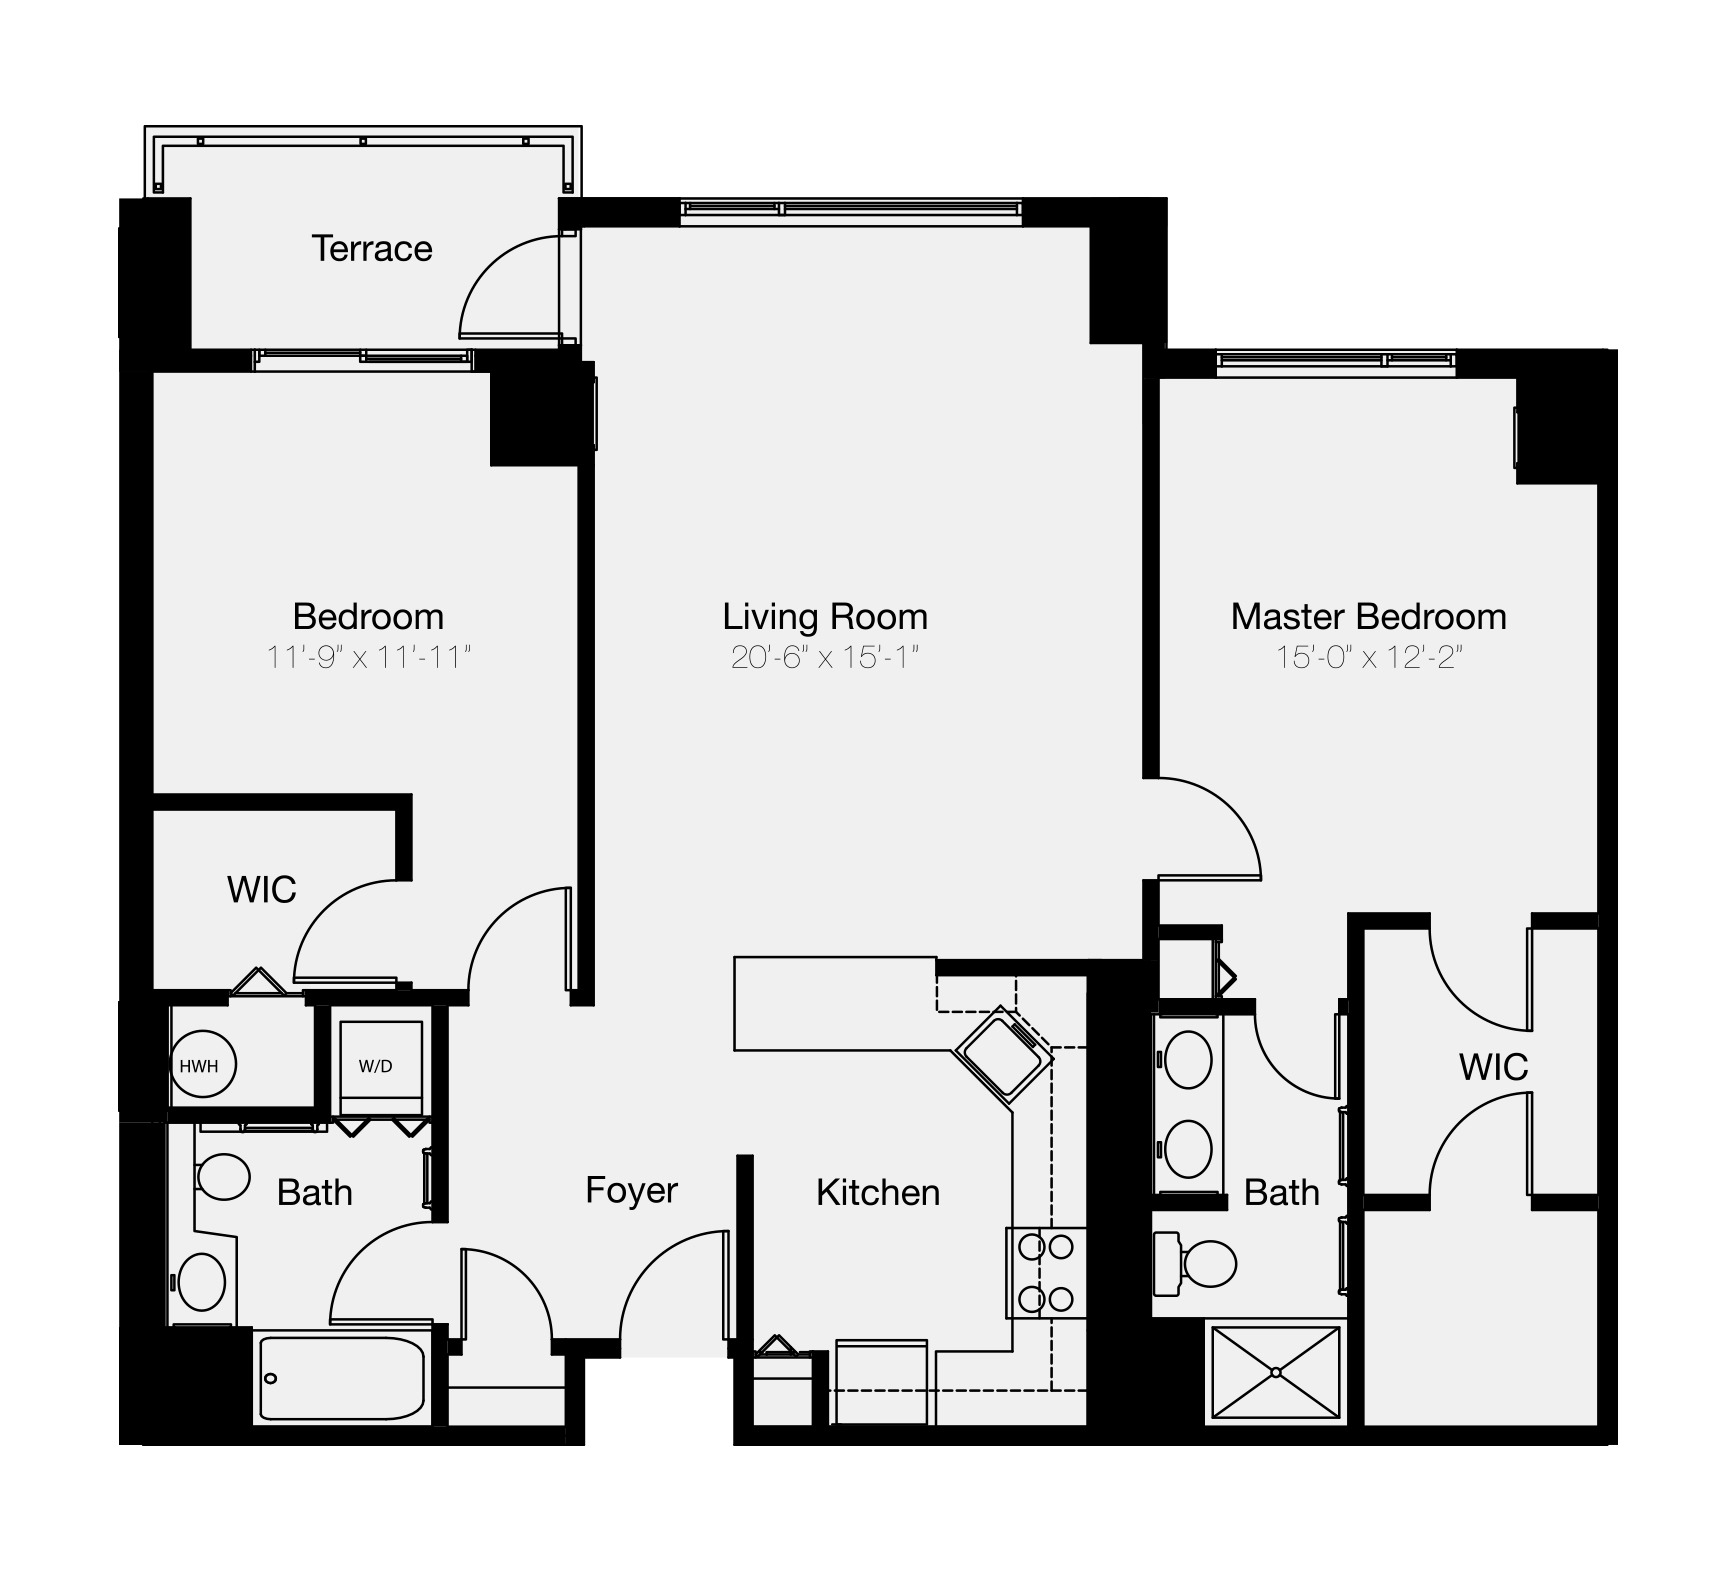 The Residences of Dockside two-bedroom condo for sale in Philadelphia